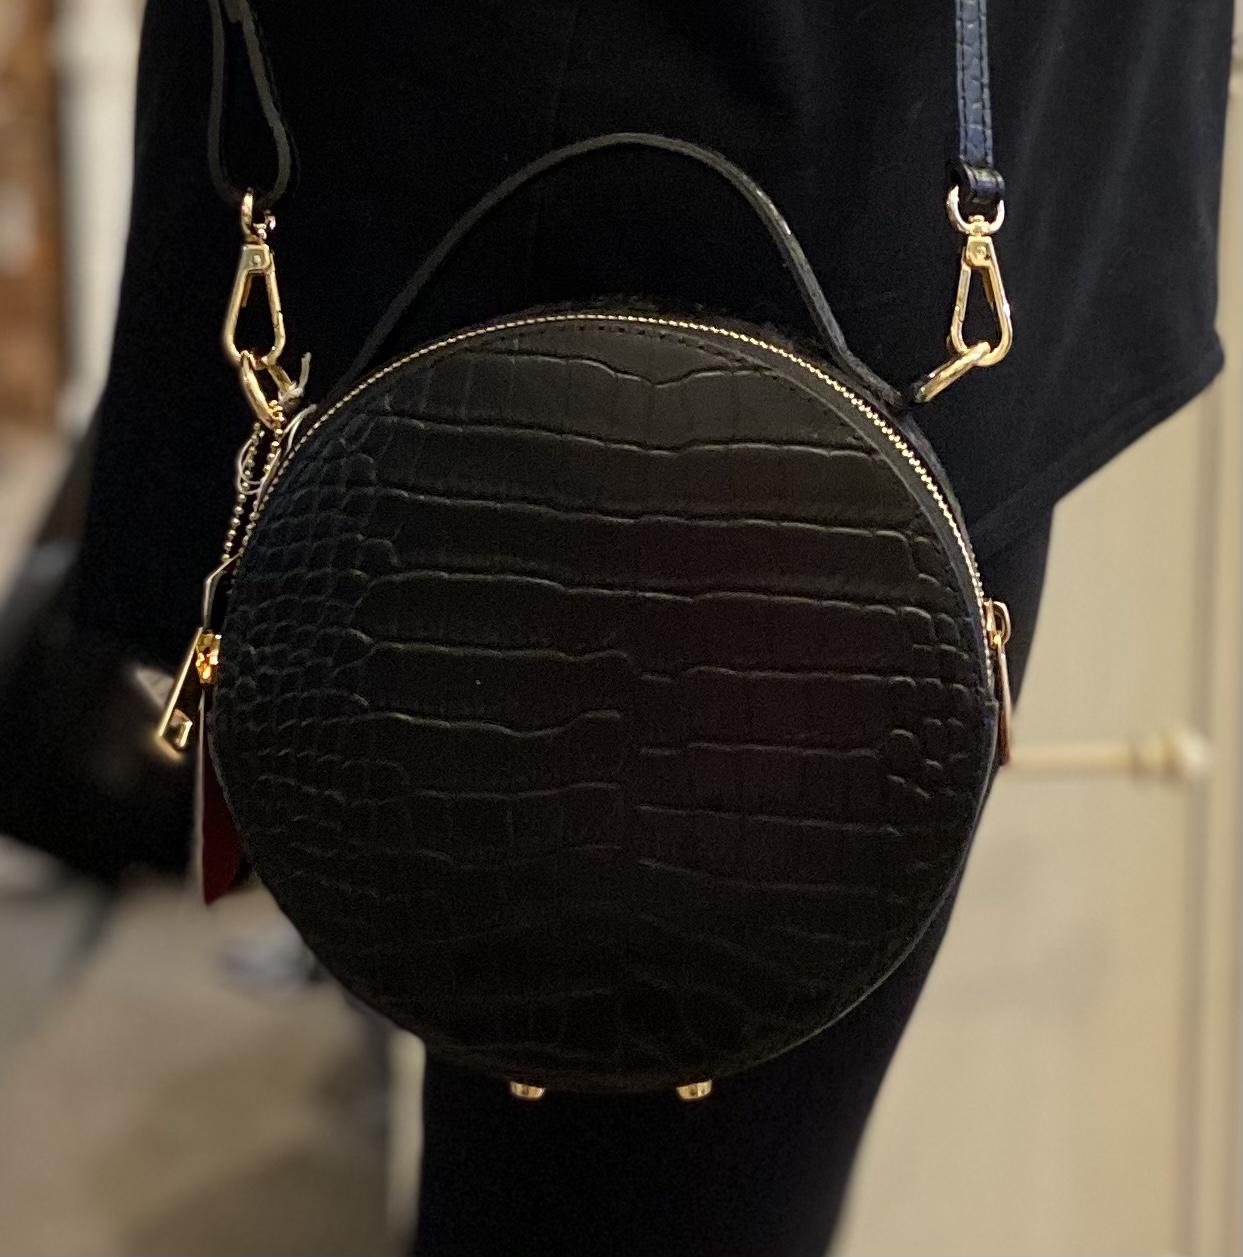 Bagitali Leather Croc Style Black Handbag